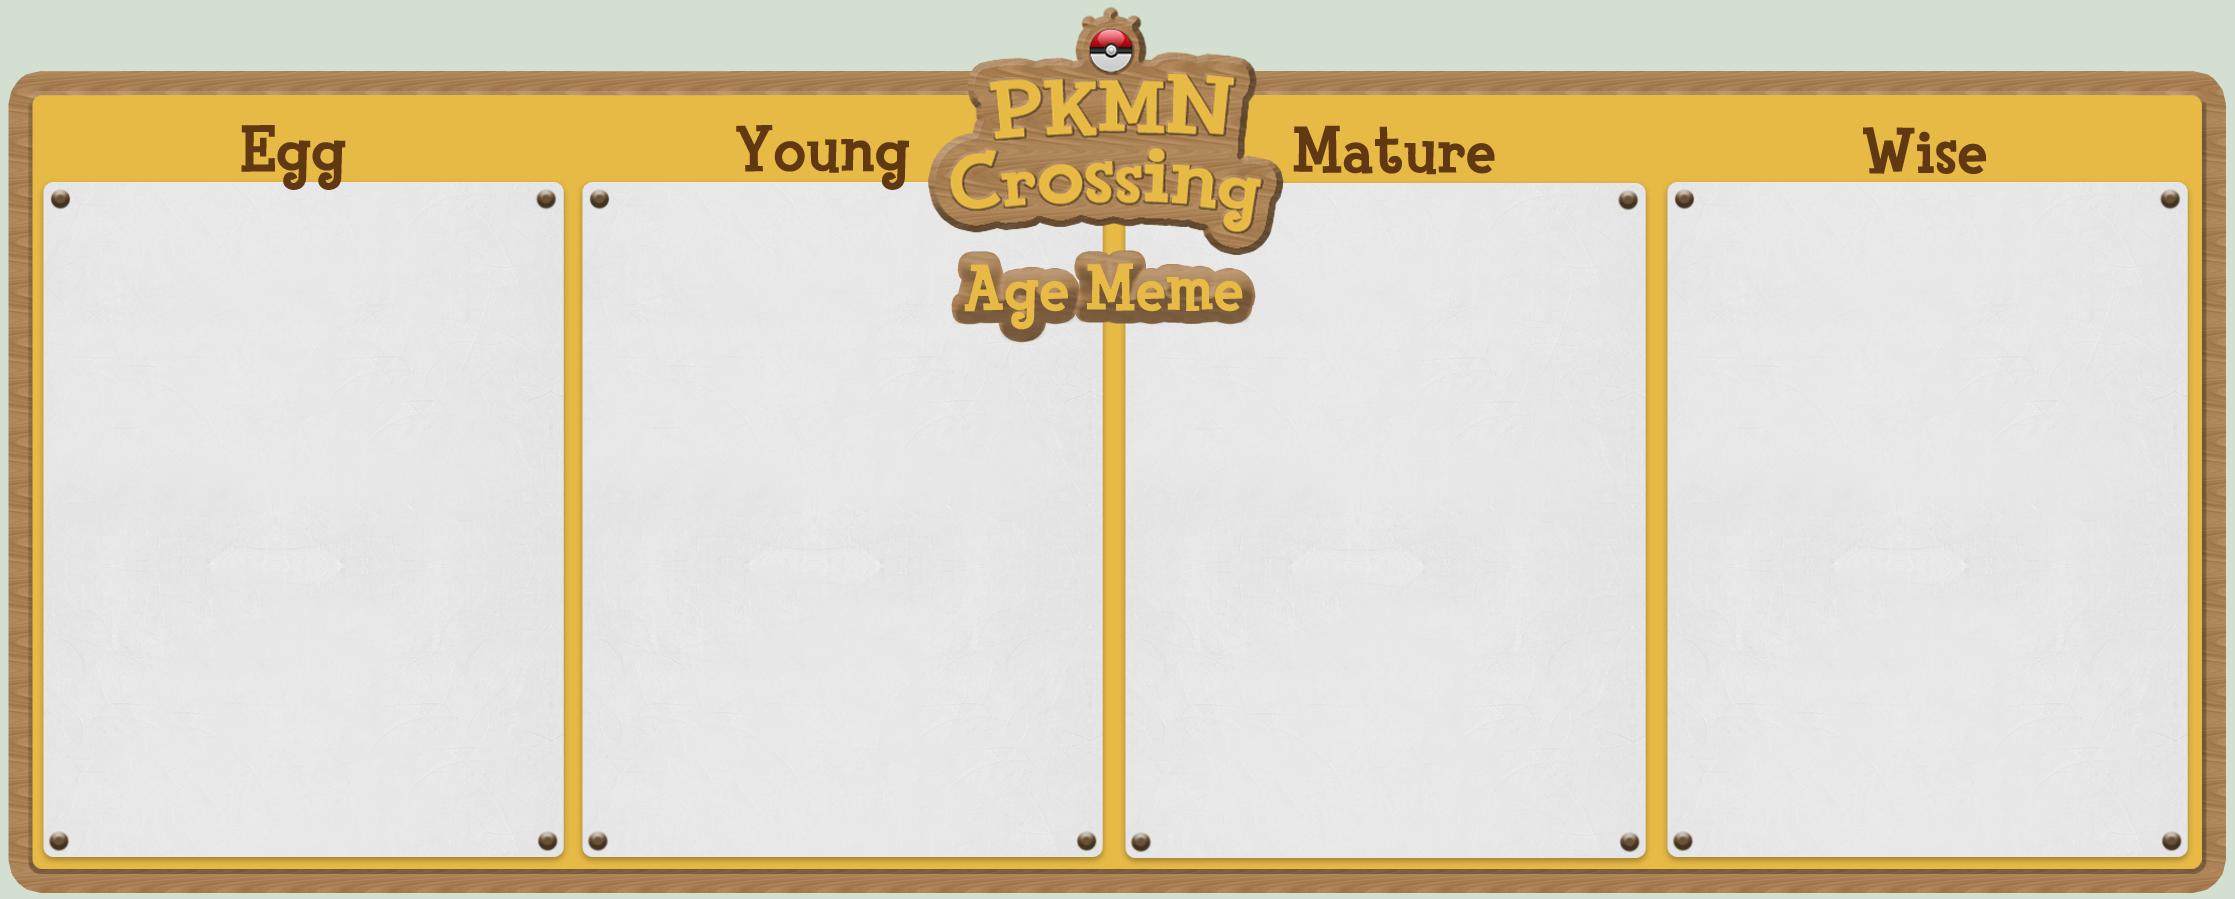 PKMC Age Meme by pahein